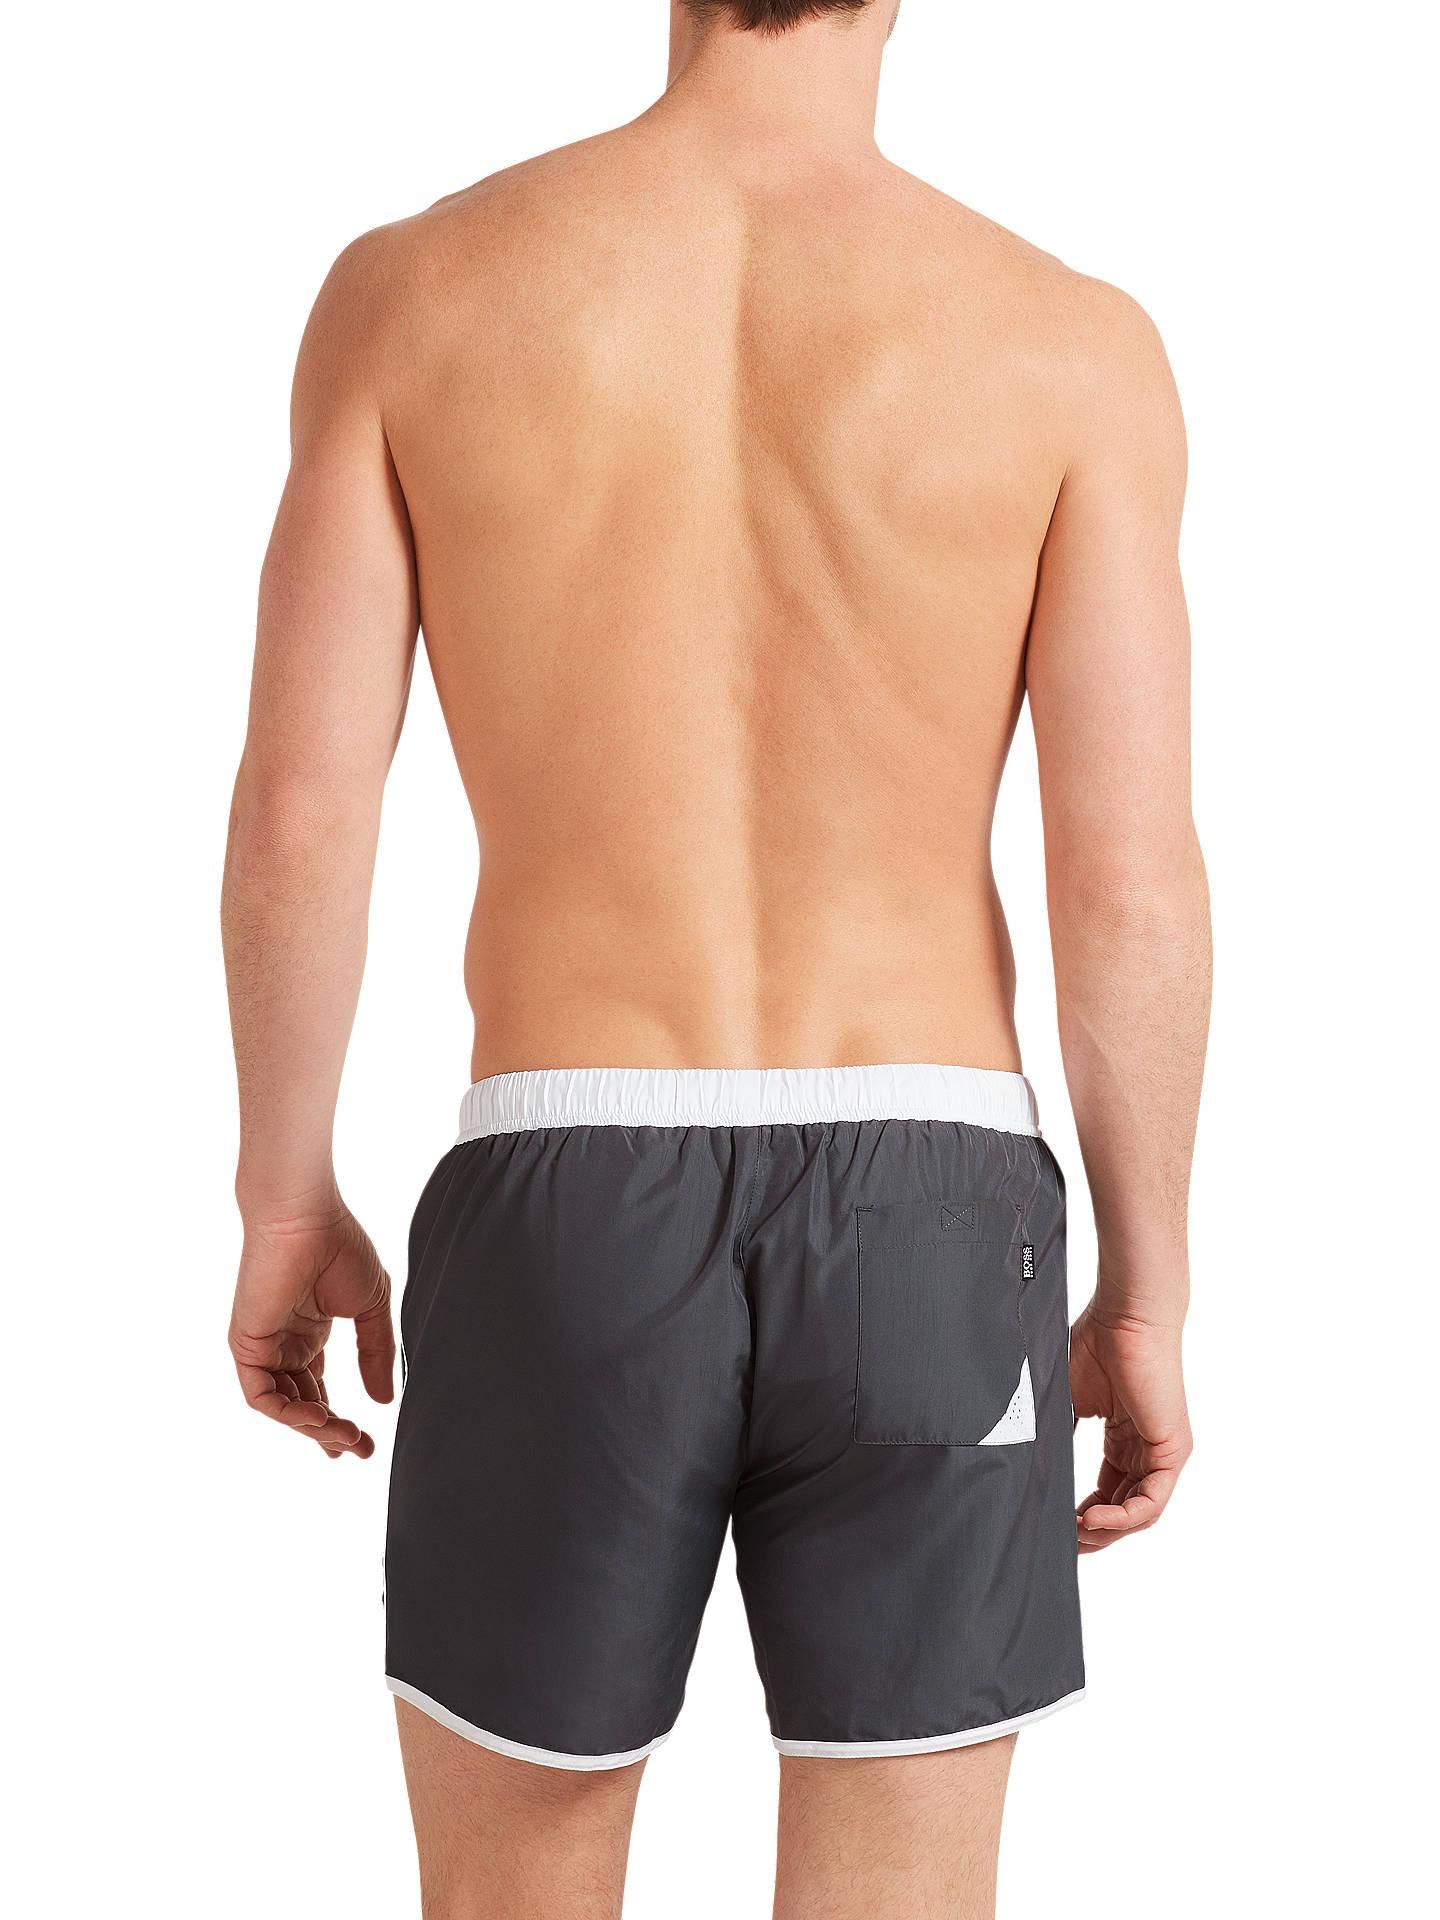 ca0393876c ... Buy BOSS Butterfly Swim Shorts, Grey, M Online at johnlewis.com ...